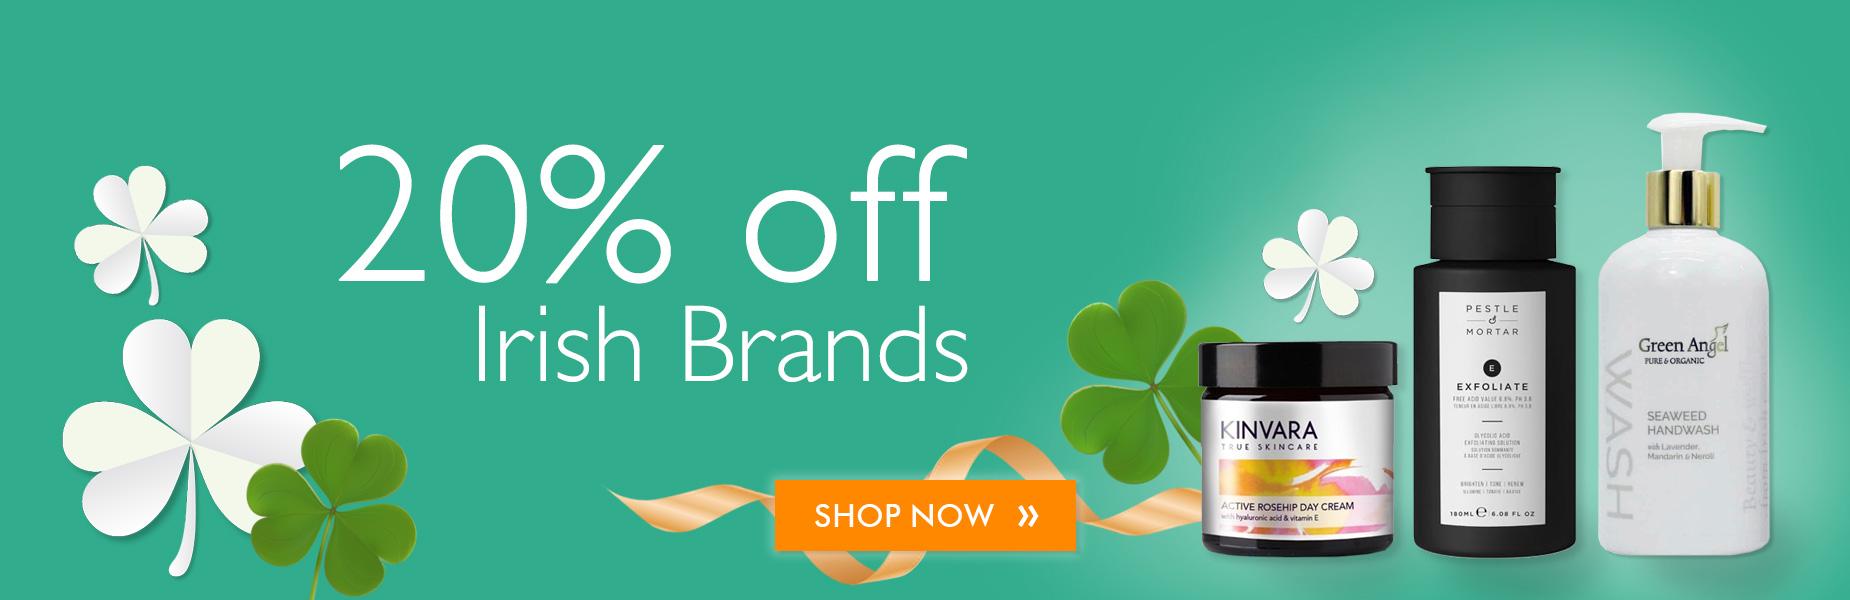 20% off Irish Brands